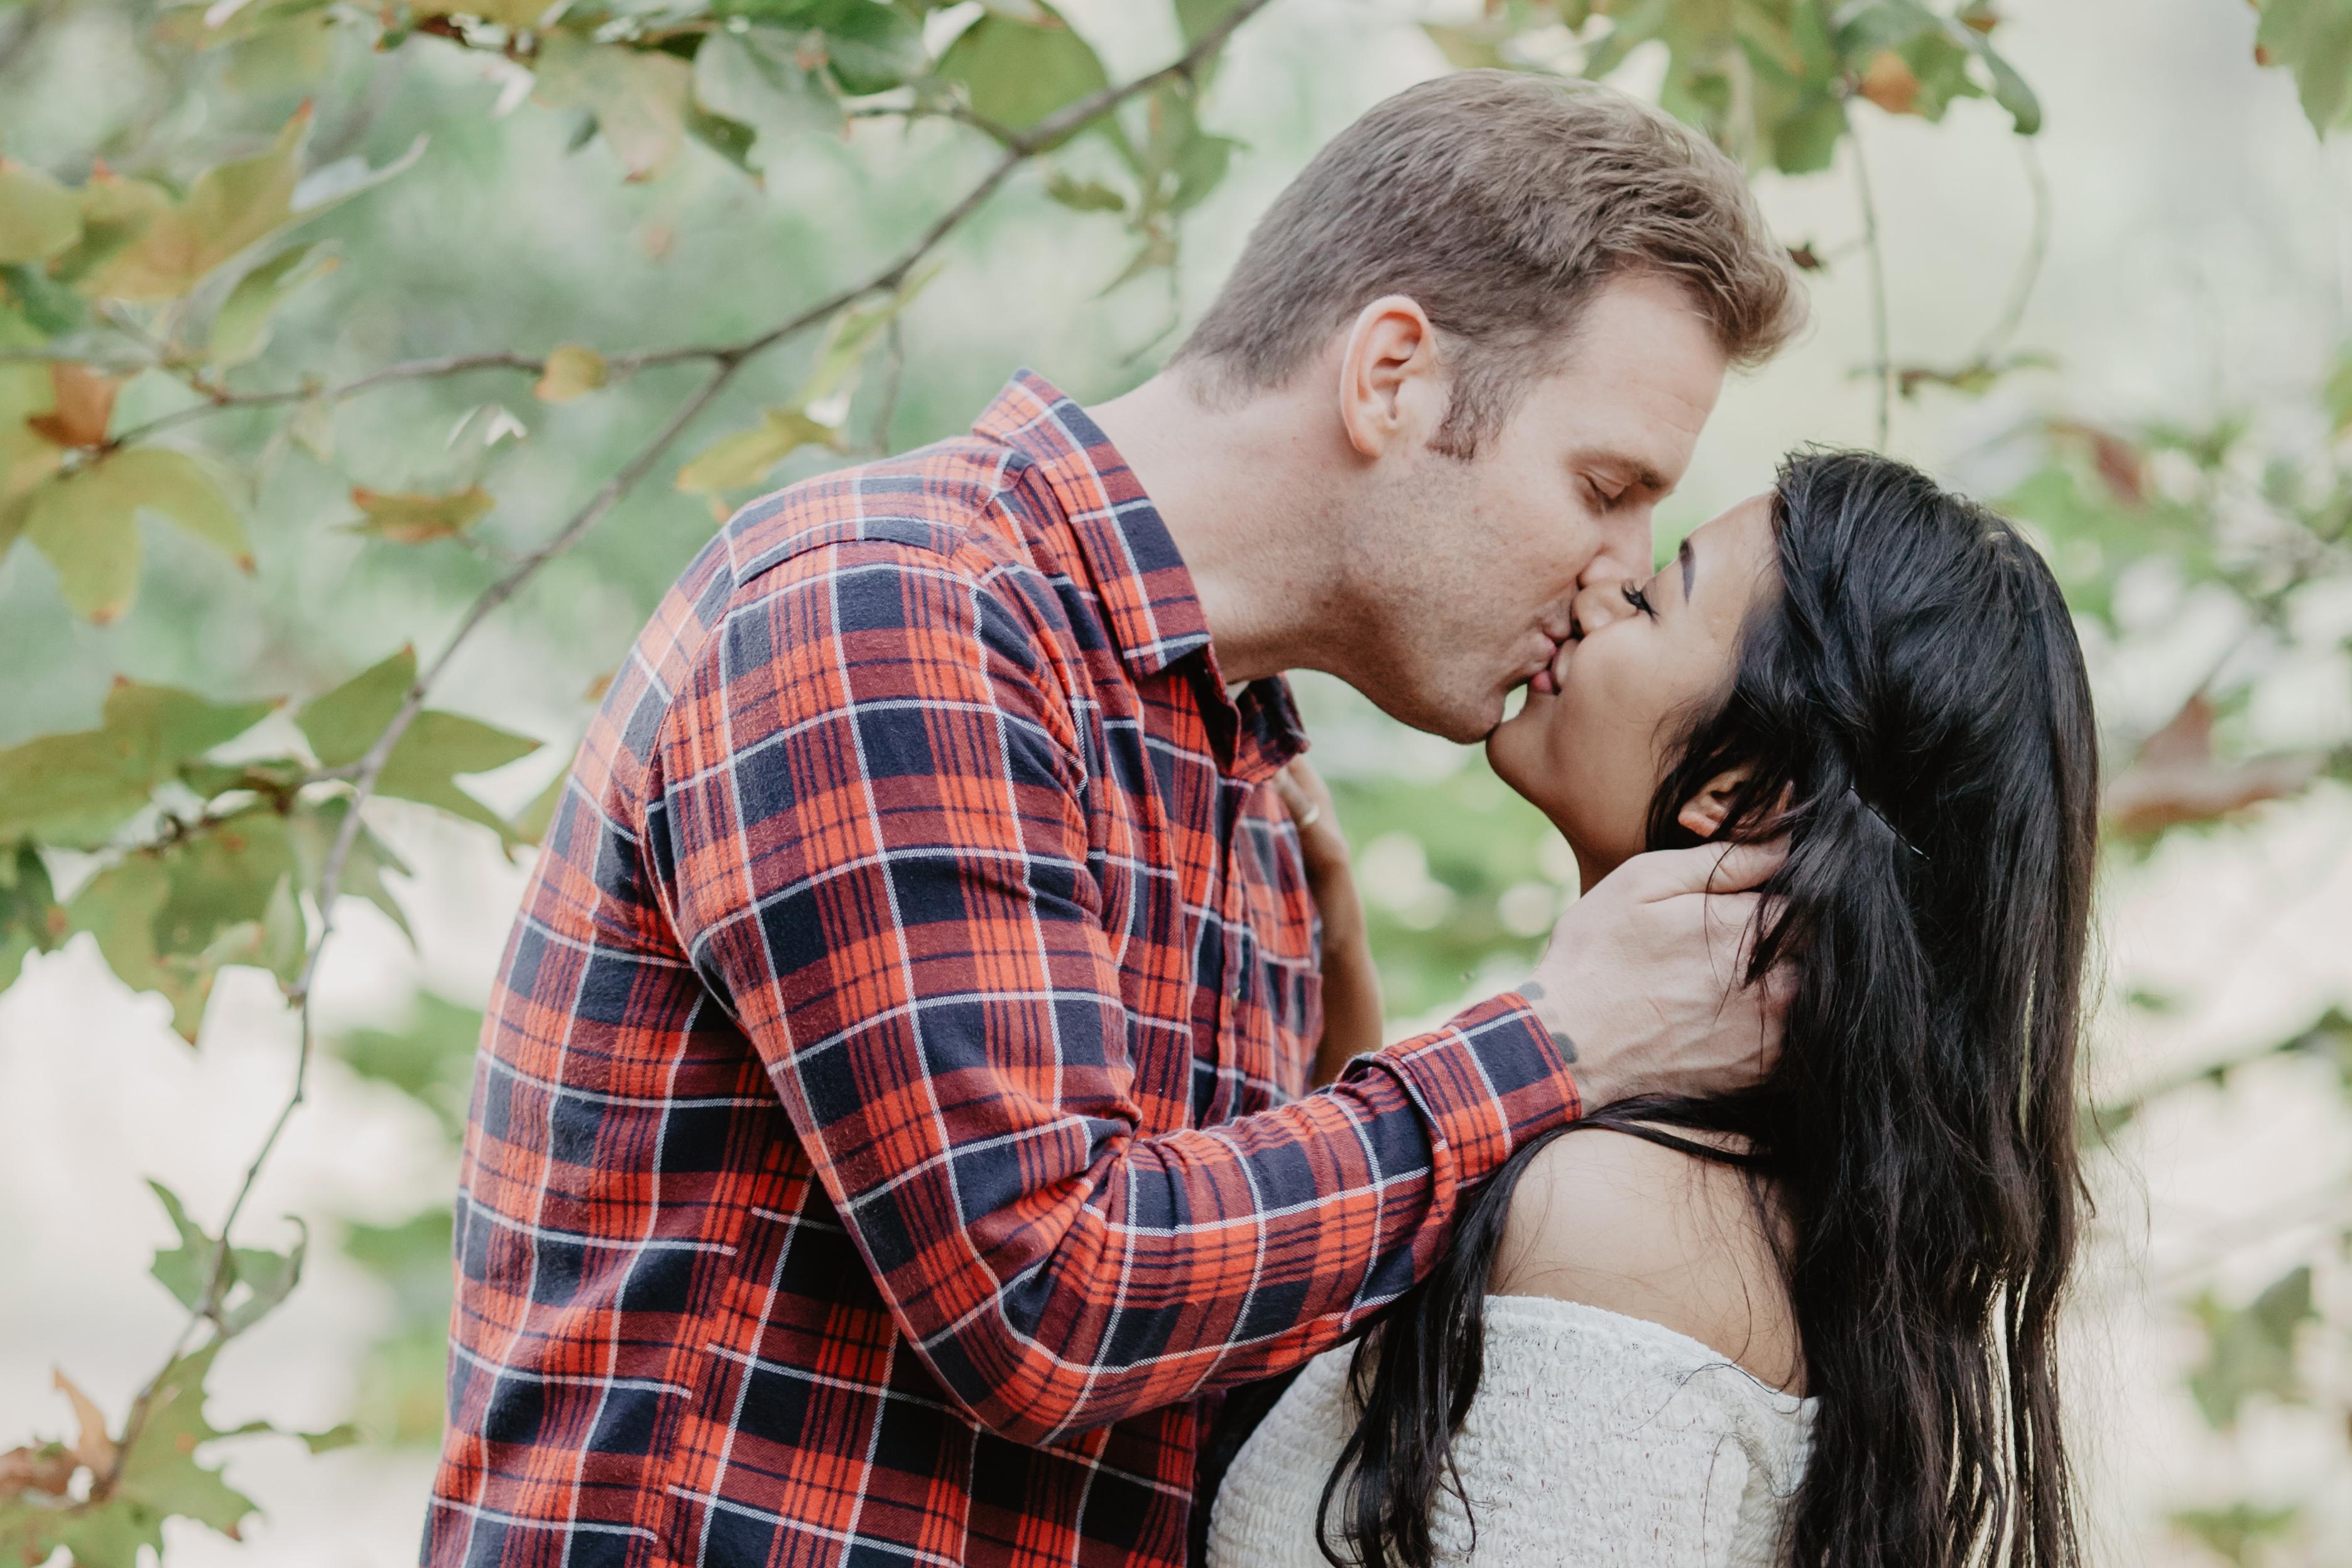 IMG 4250 2 - Lei and Matthew | Engaged | San Diego wedding photographer